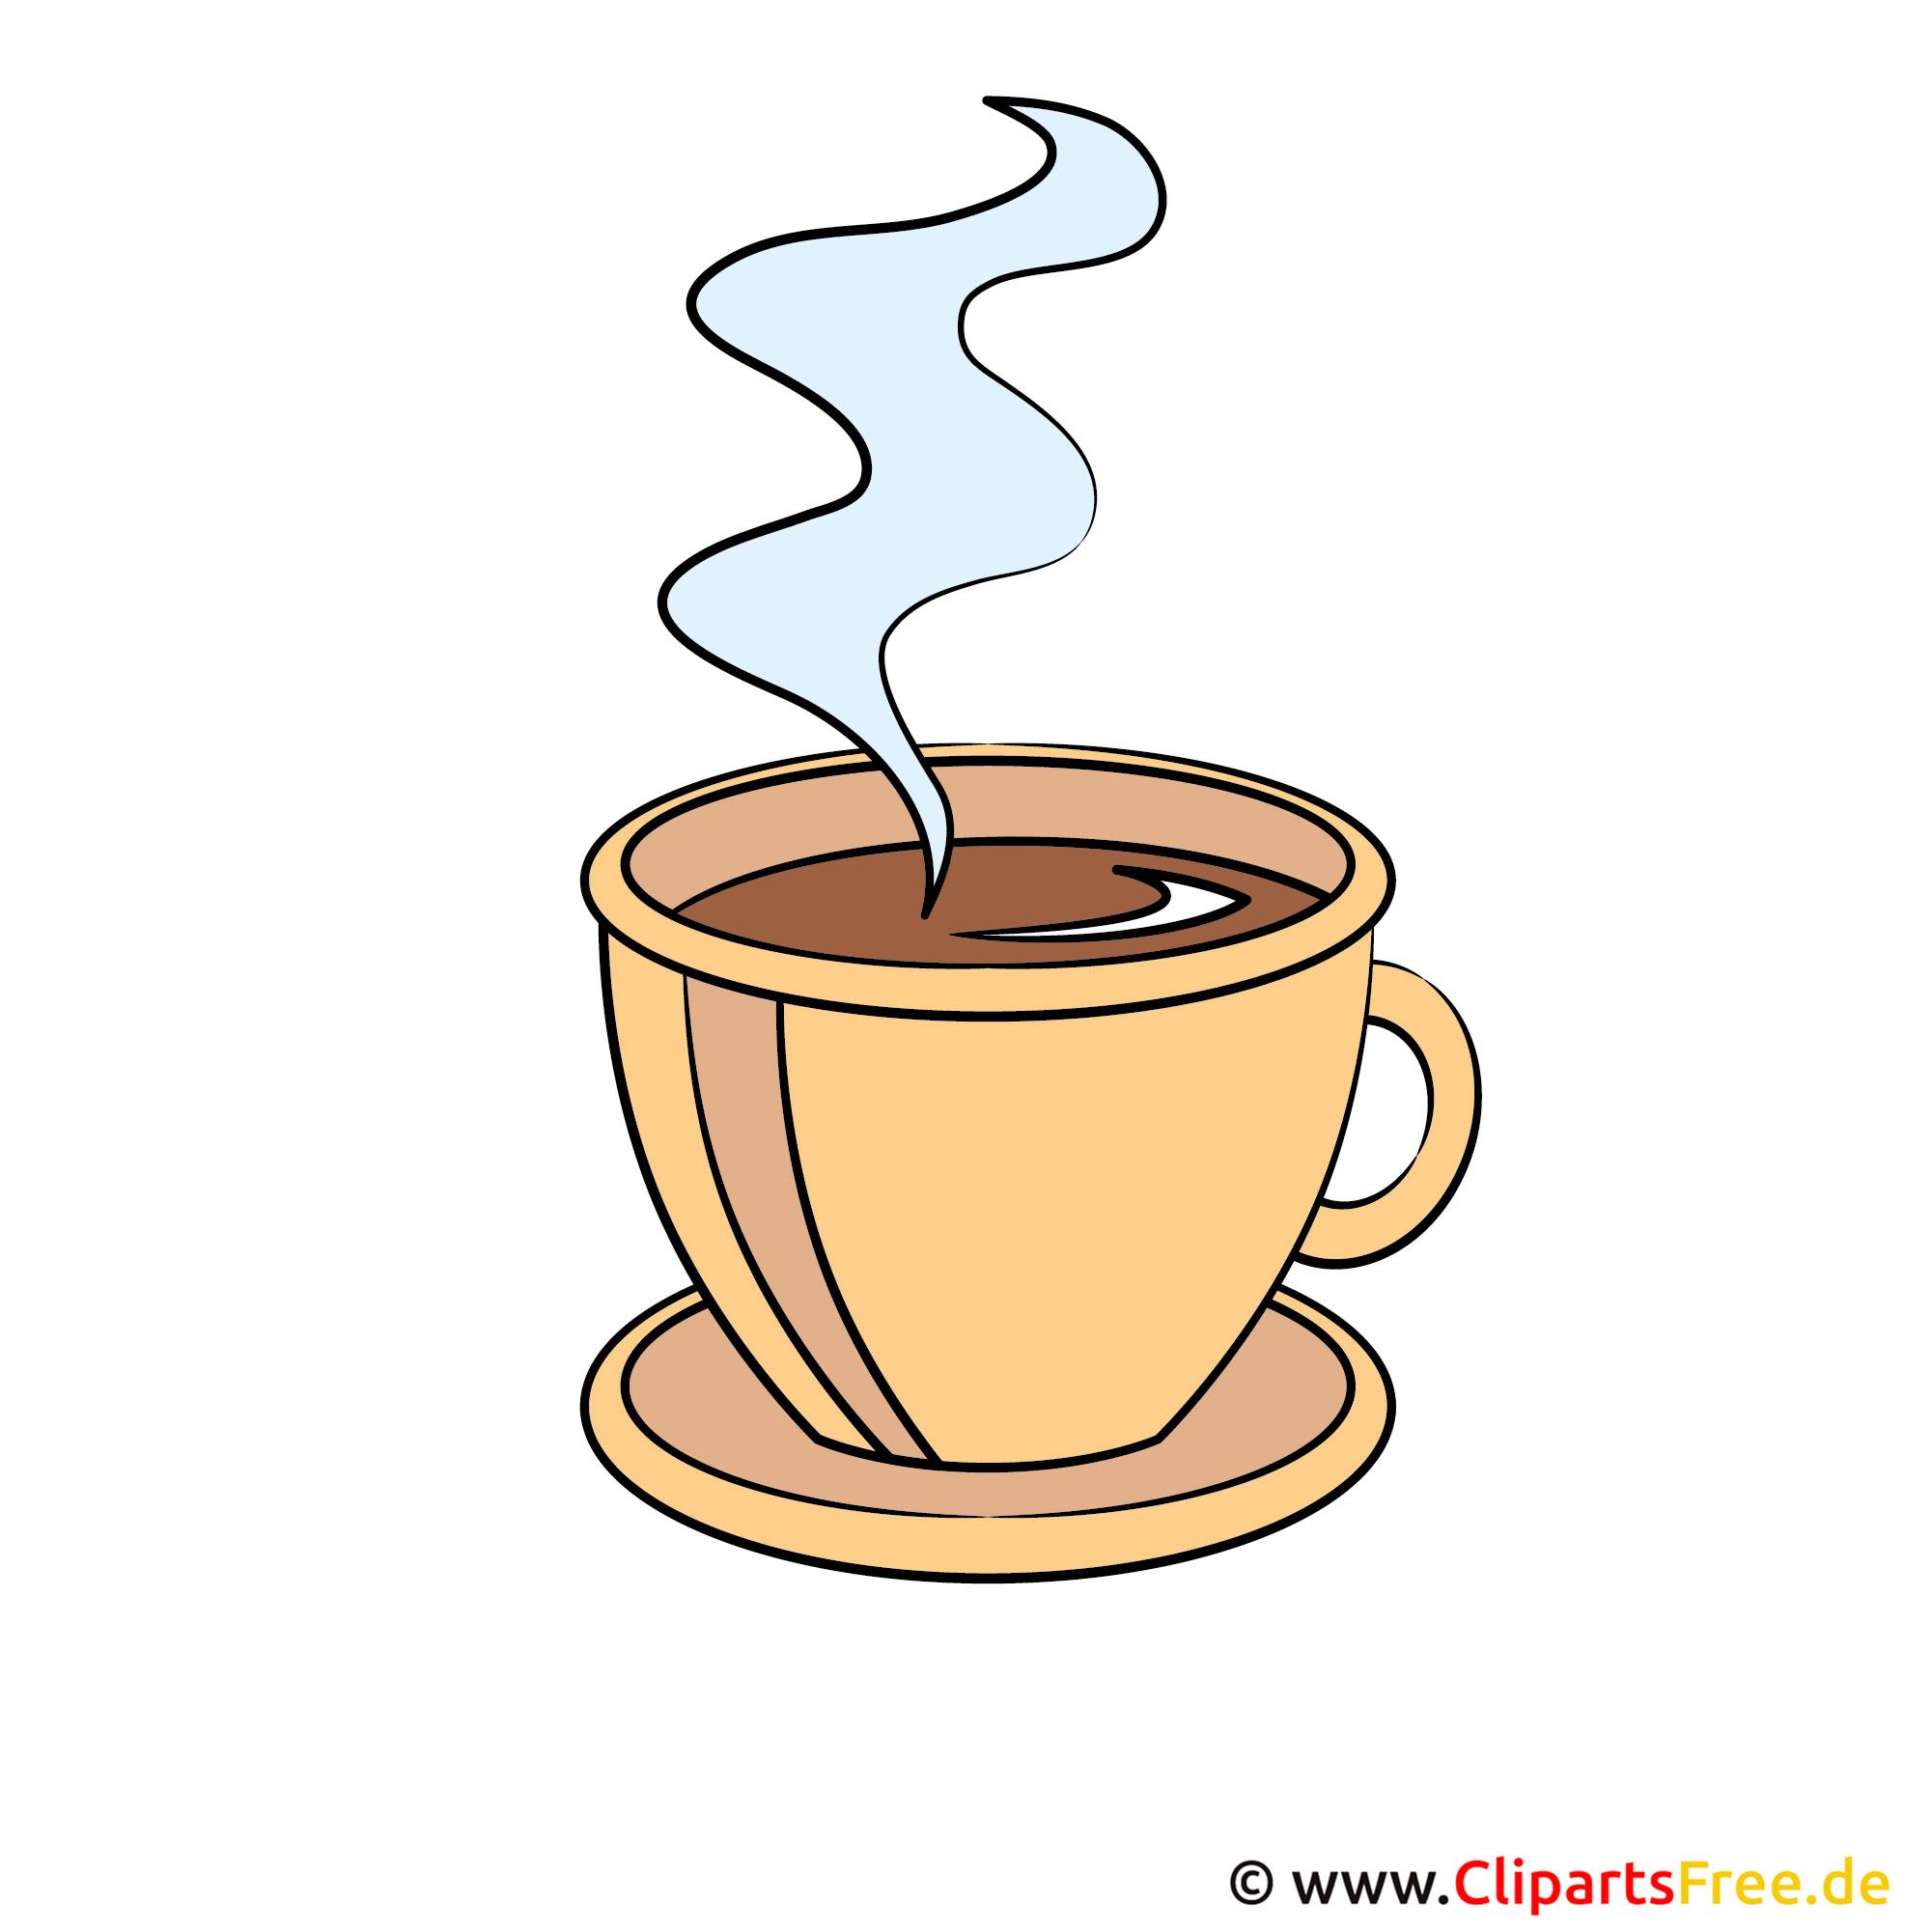 Kaffeetasse Clip Art, Bild, Grafik, Illustration